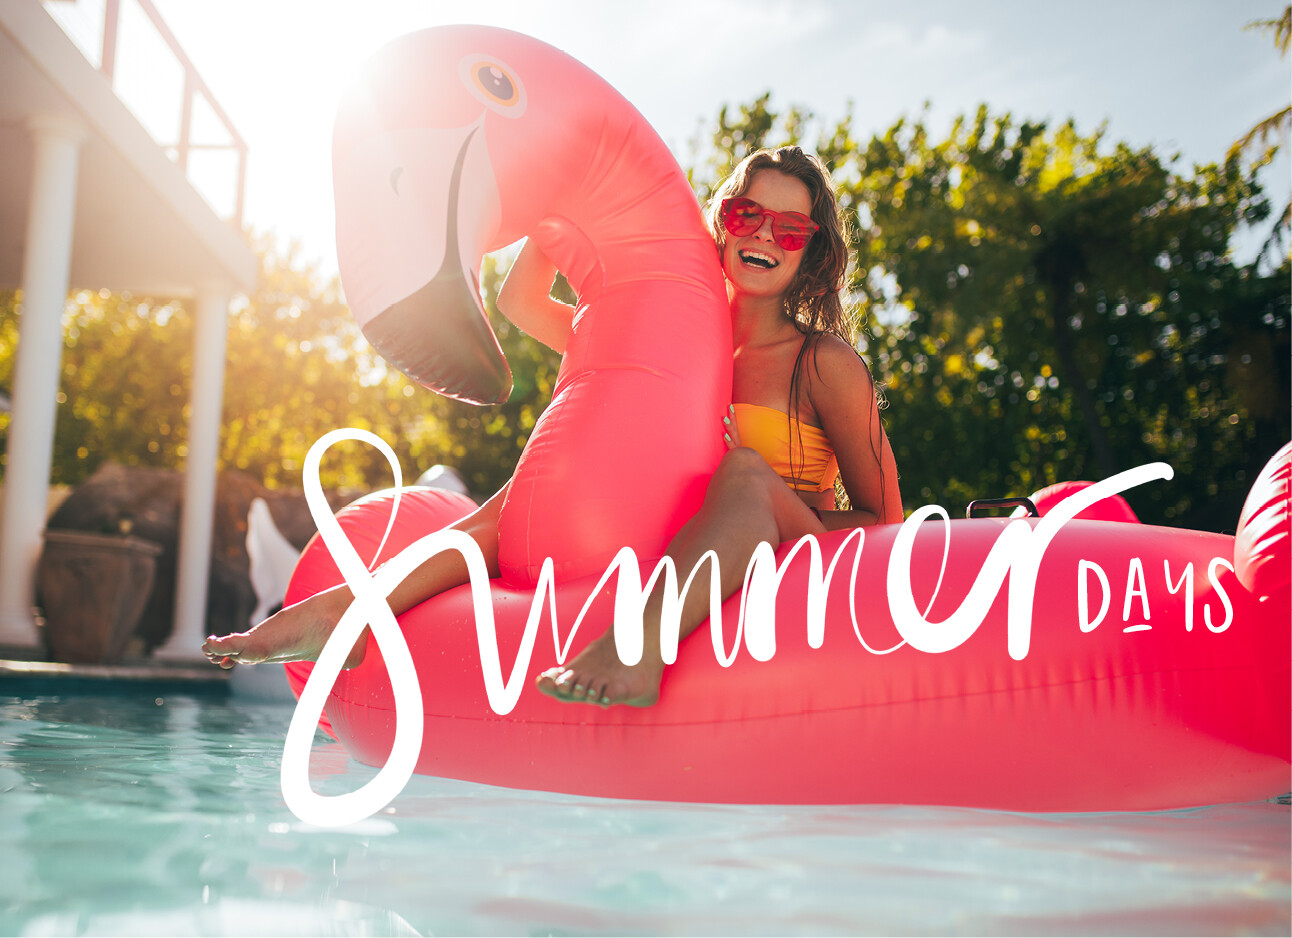 meisje op roze flamingo groot in zwembad